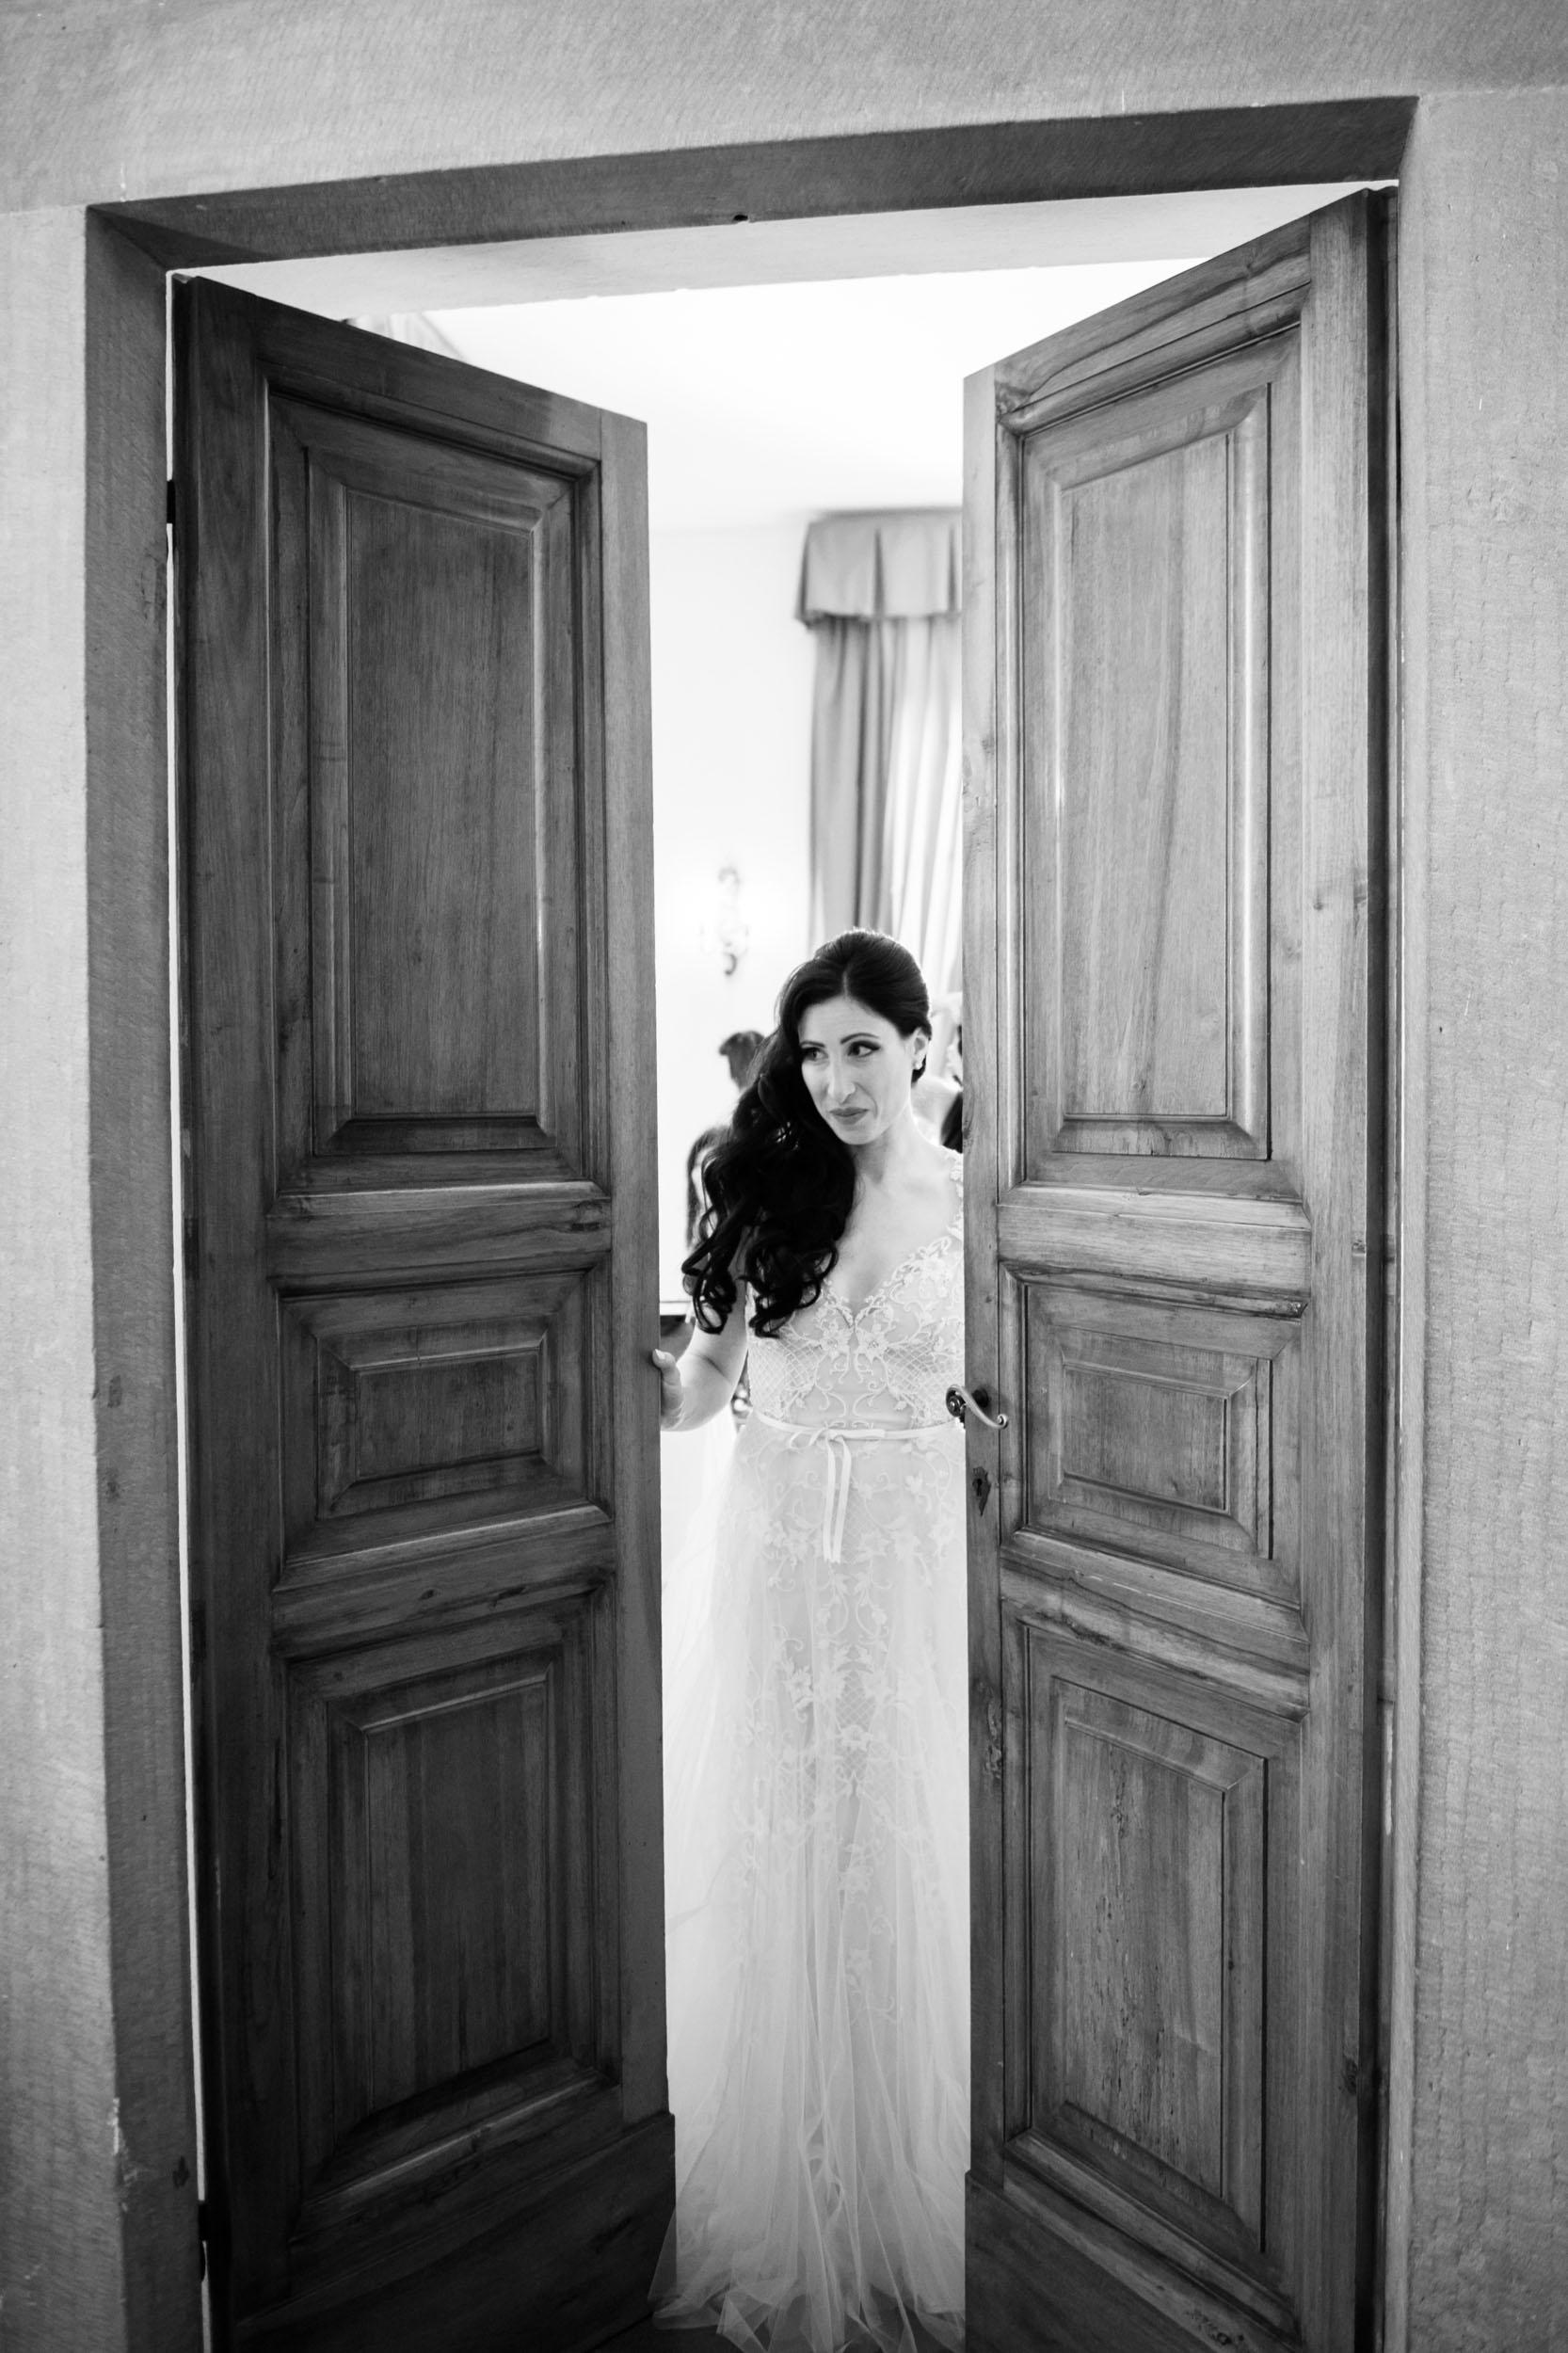 villa-gamberaia-florence-italy-destination-wedding-13.jpg